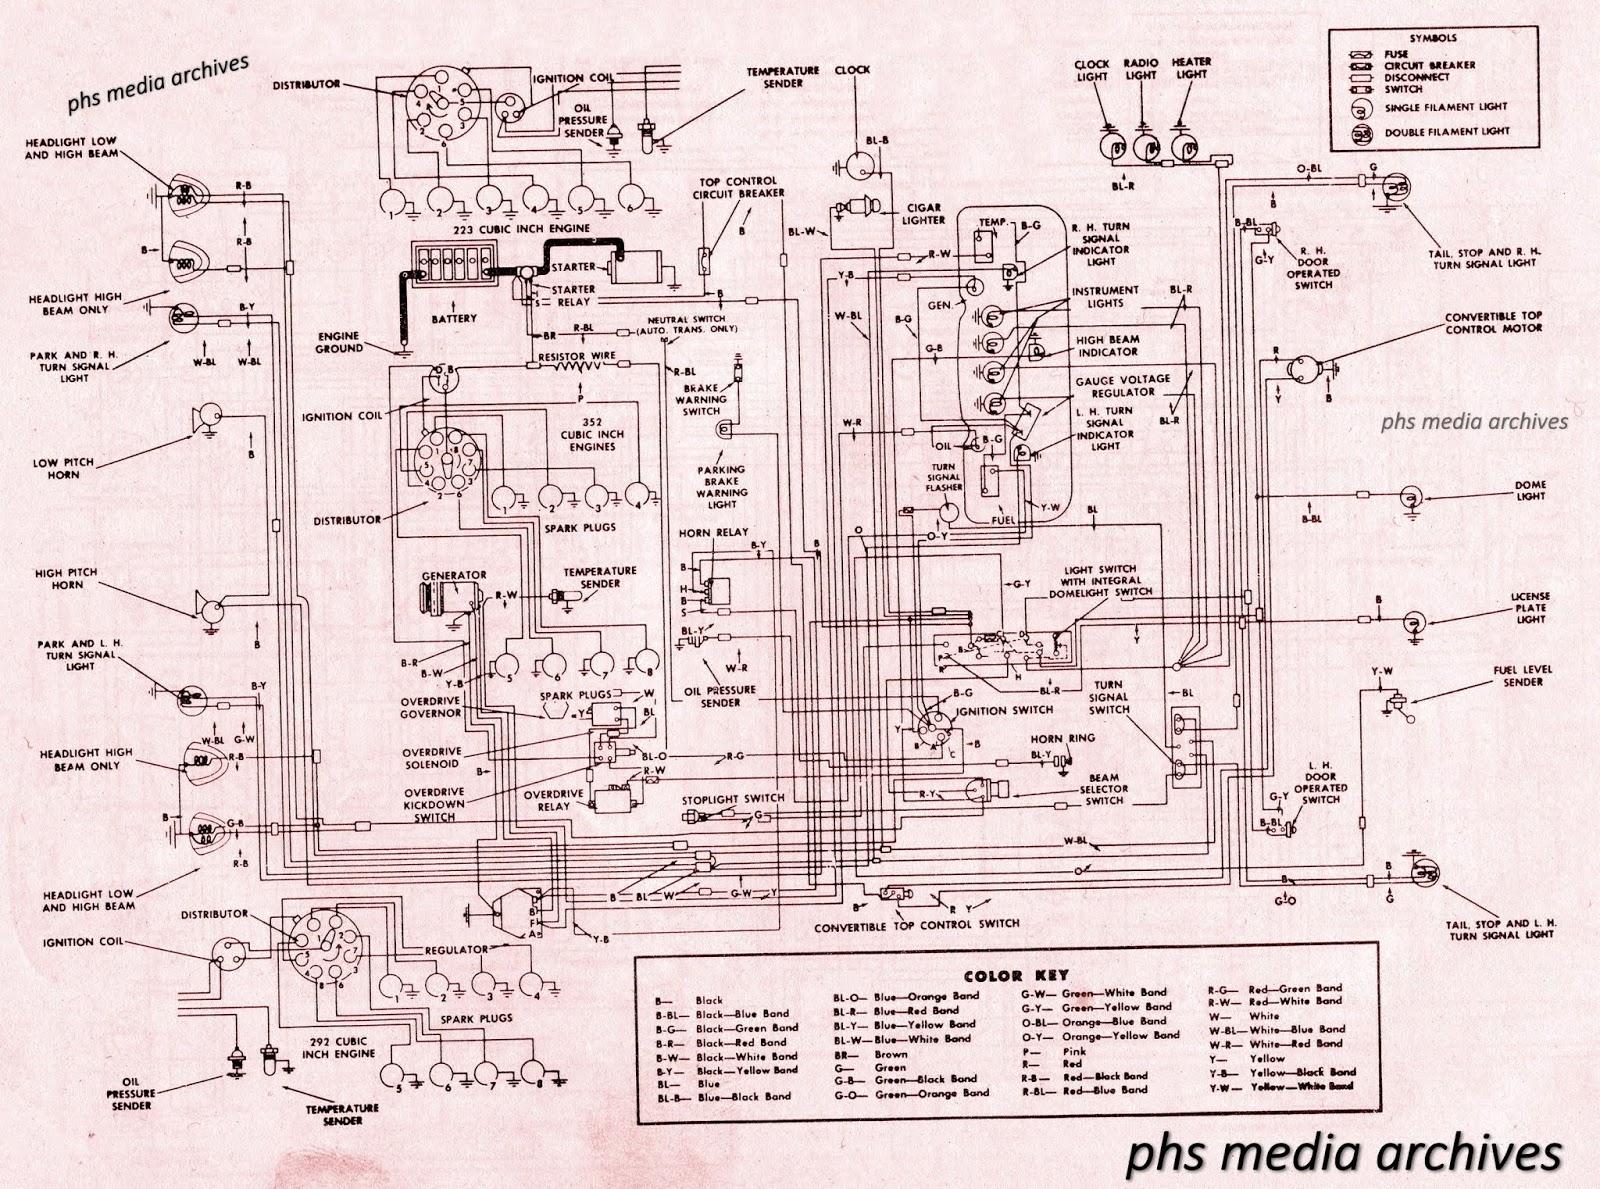 1960 thunderbird wiring diagrams - diagram & symbol wiring circuit-penny -  circuit-penny.parliamoneassieme.it  circuit-penny.parliamoneassieme.it